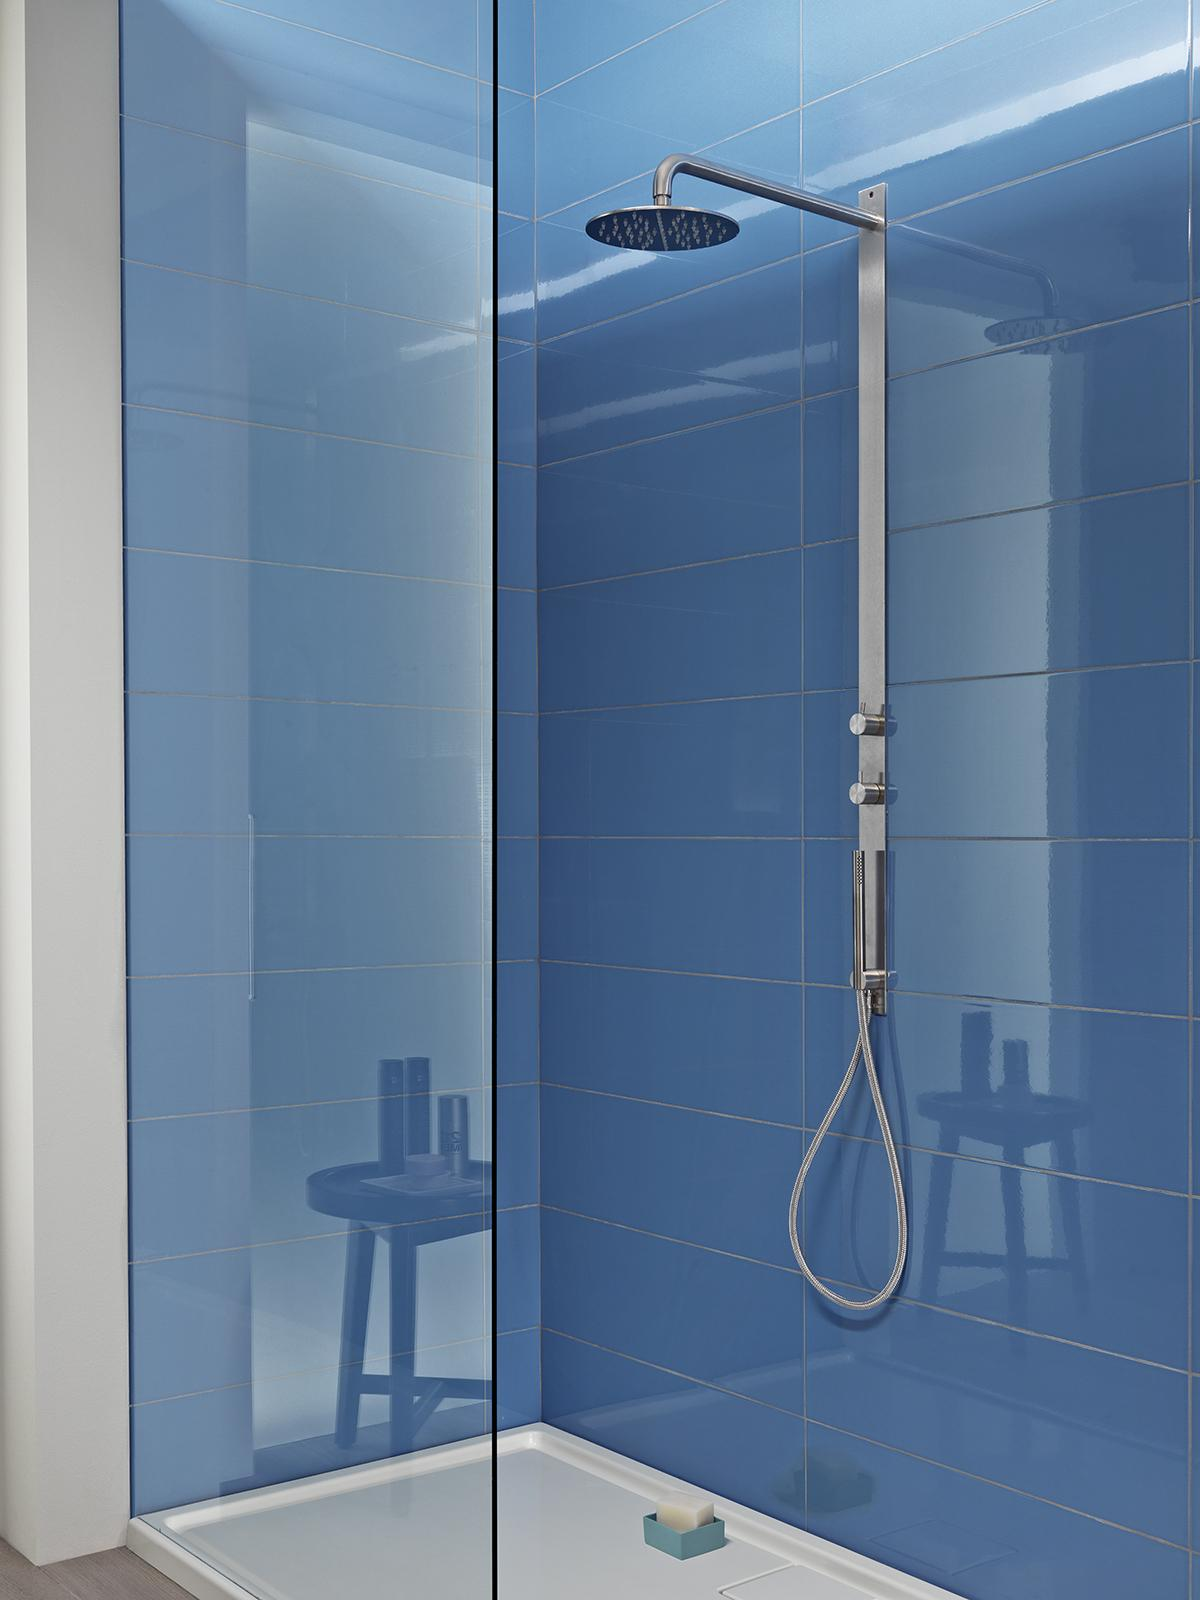 Colourline - Polished porcelain bathroom wall tiling | Marazzi